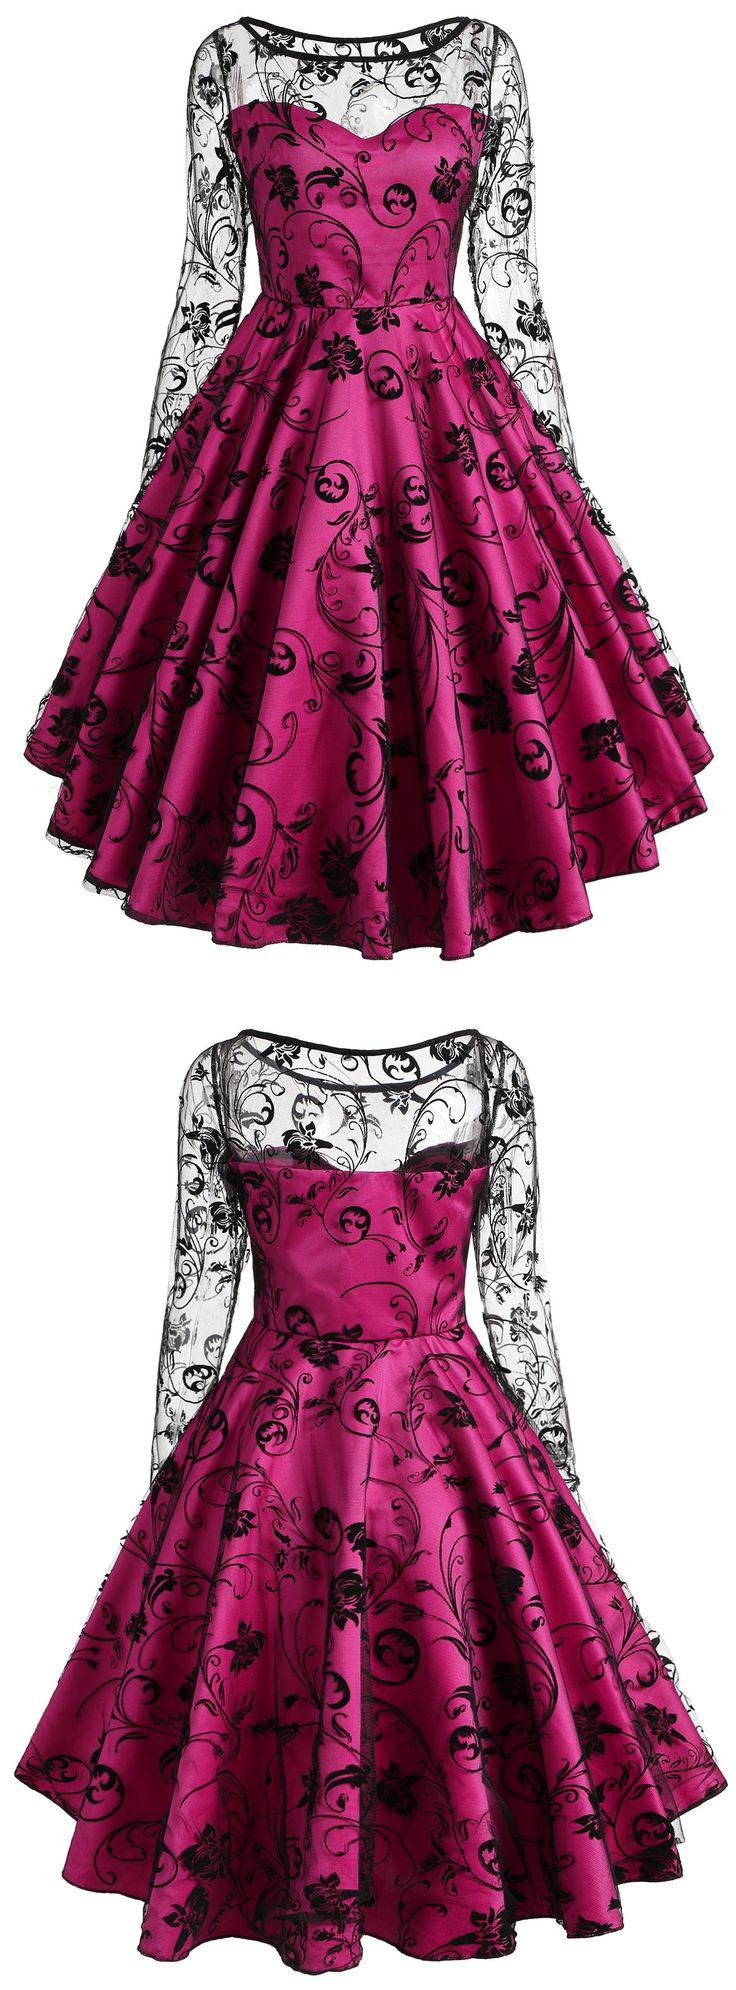 Valentine Lace Overlay Vintage Dress | $17.72 + Free Shipping | #womensfashion #vintagedress #valentinesday